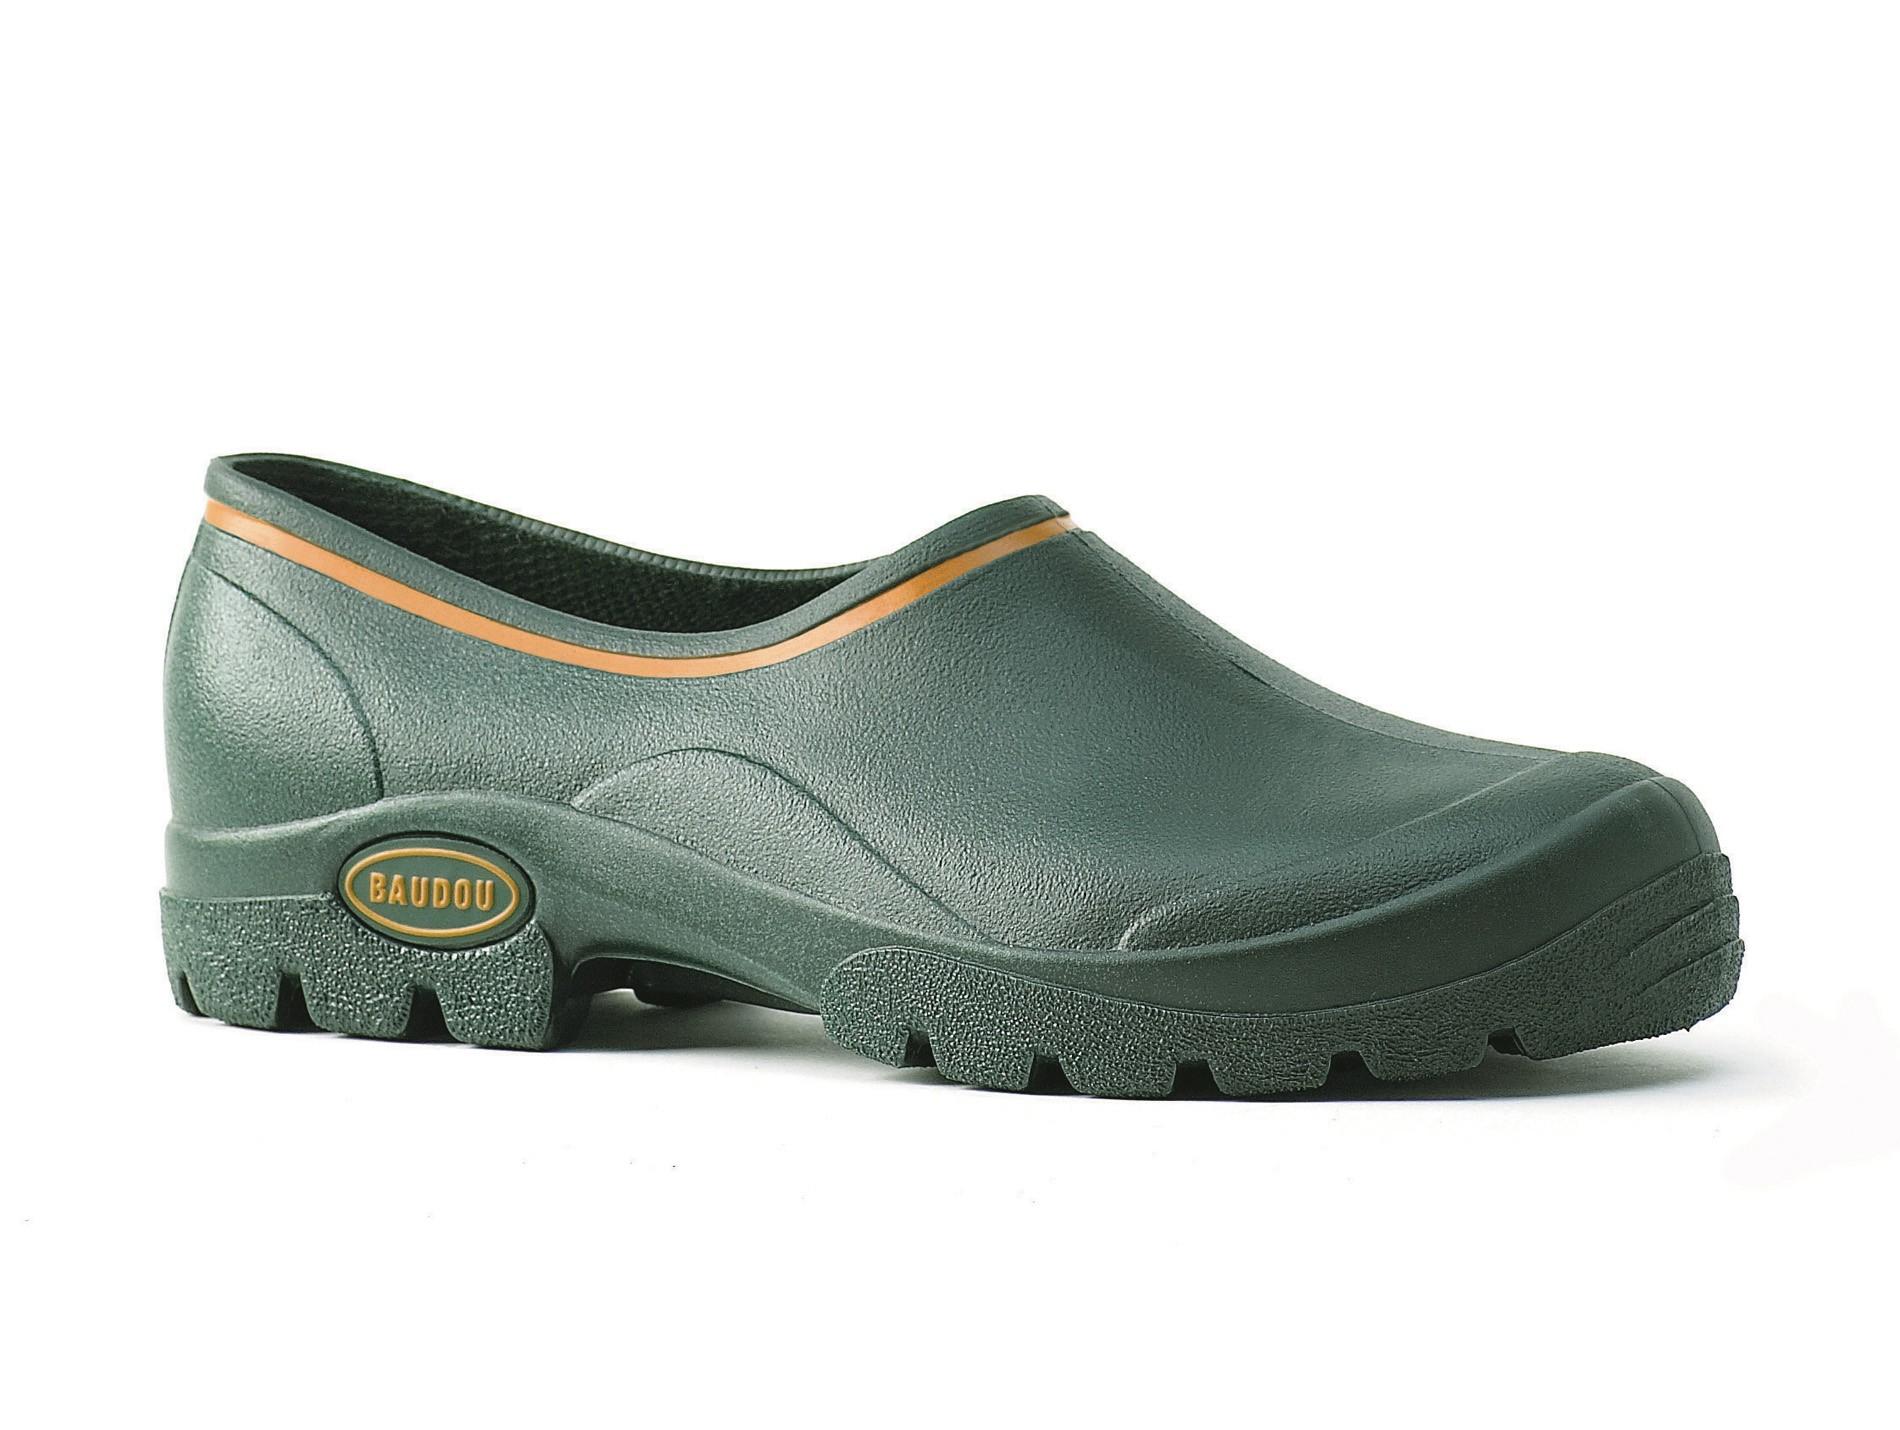 Sabots De Jardin Baudou Cork Vert - Chaussures De Travail ... serapportantà Chaussure Jardin